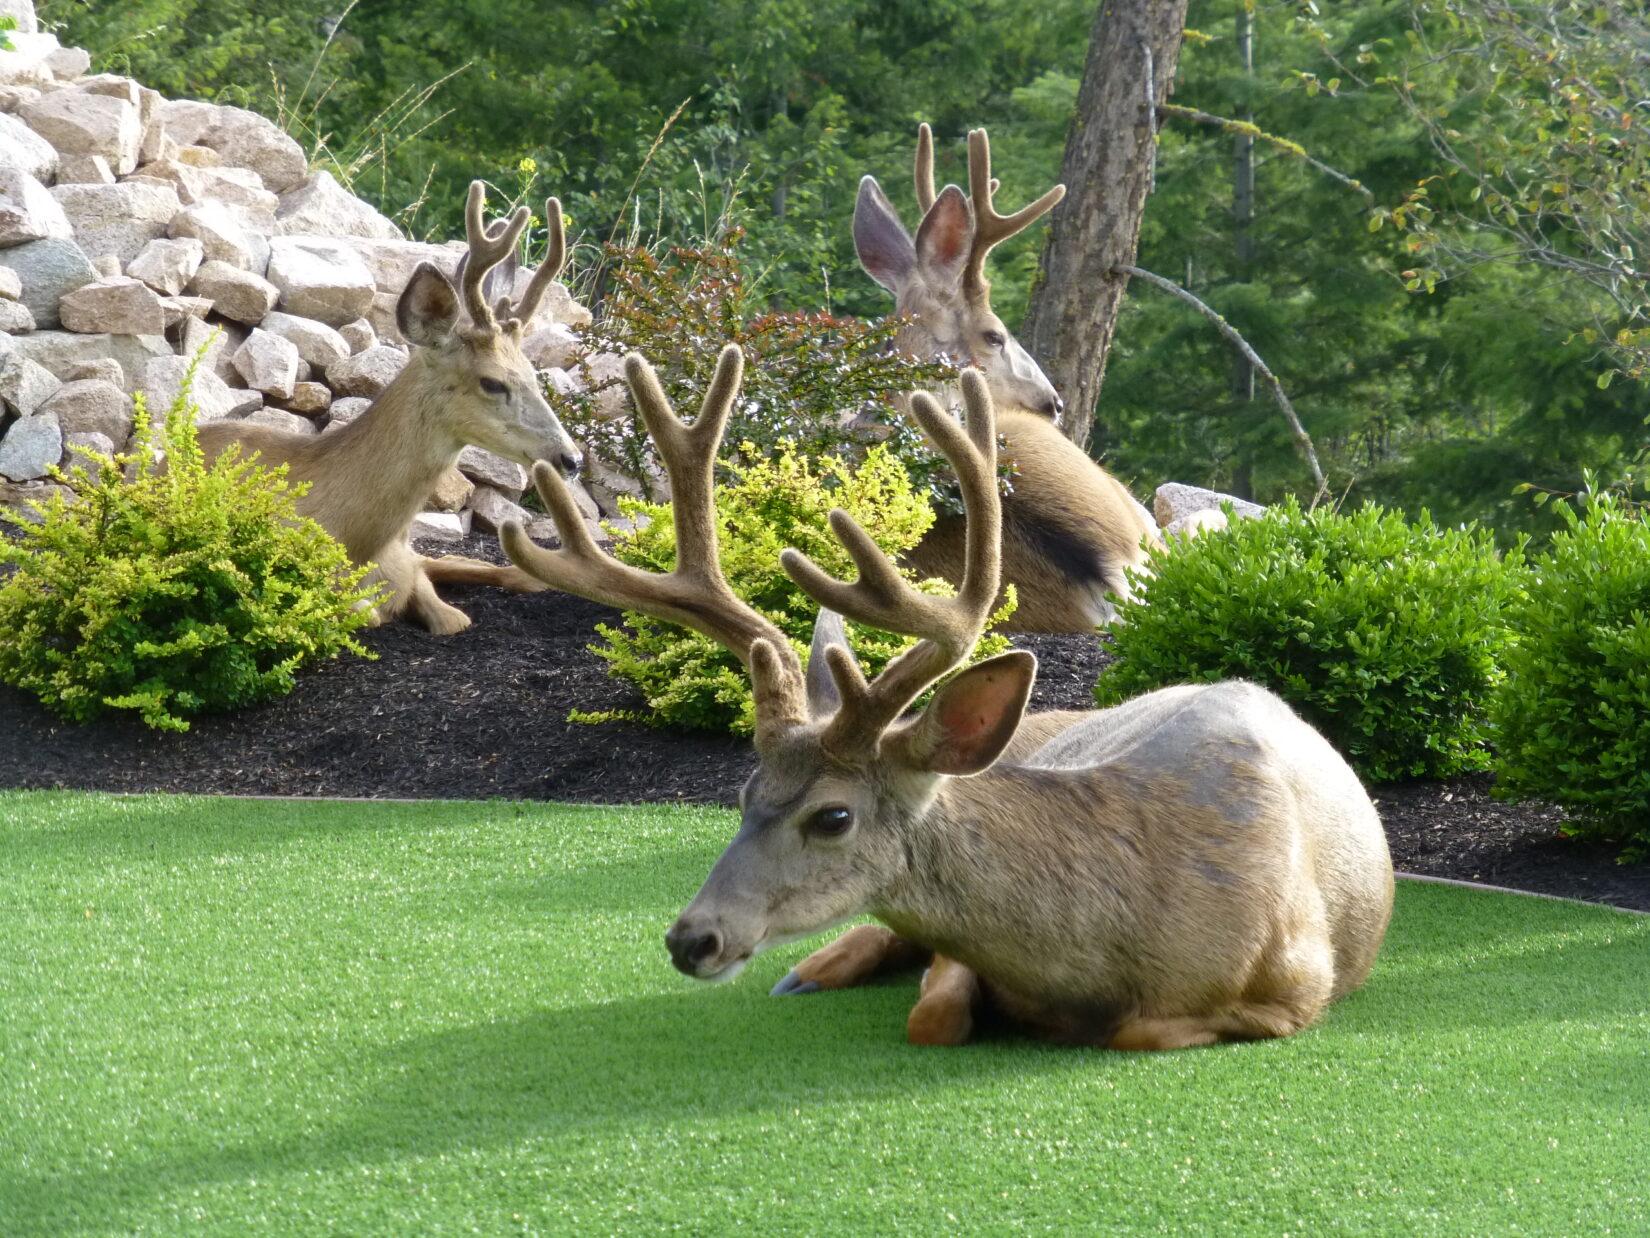 Deer resting on garden lawn